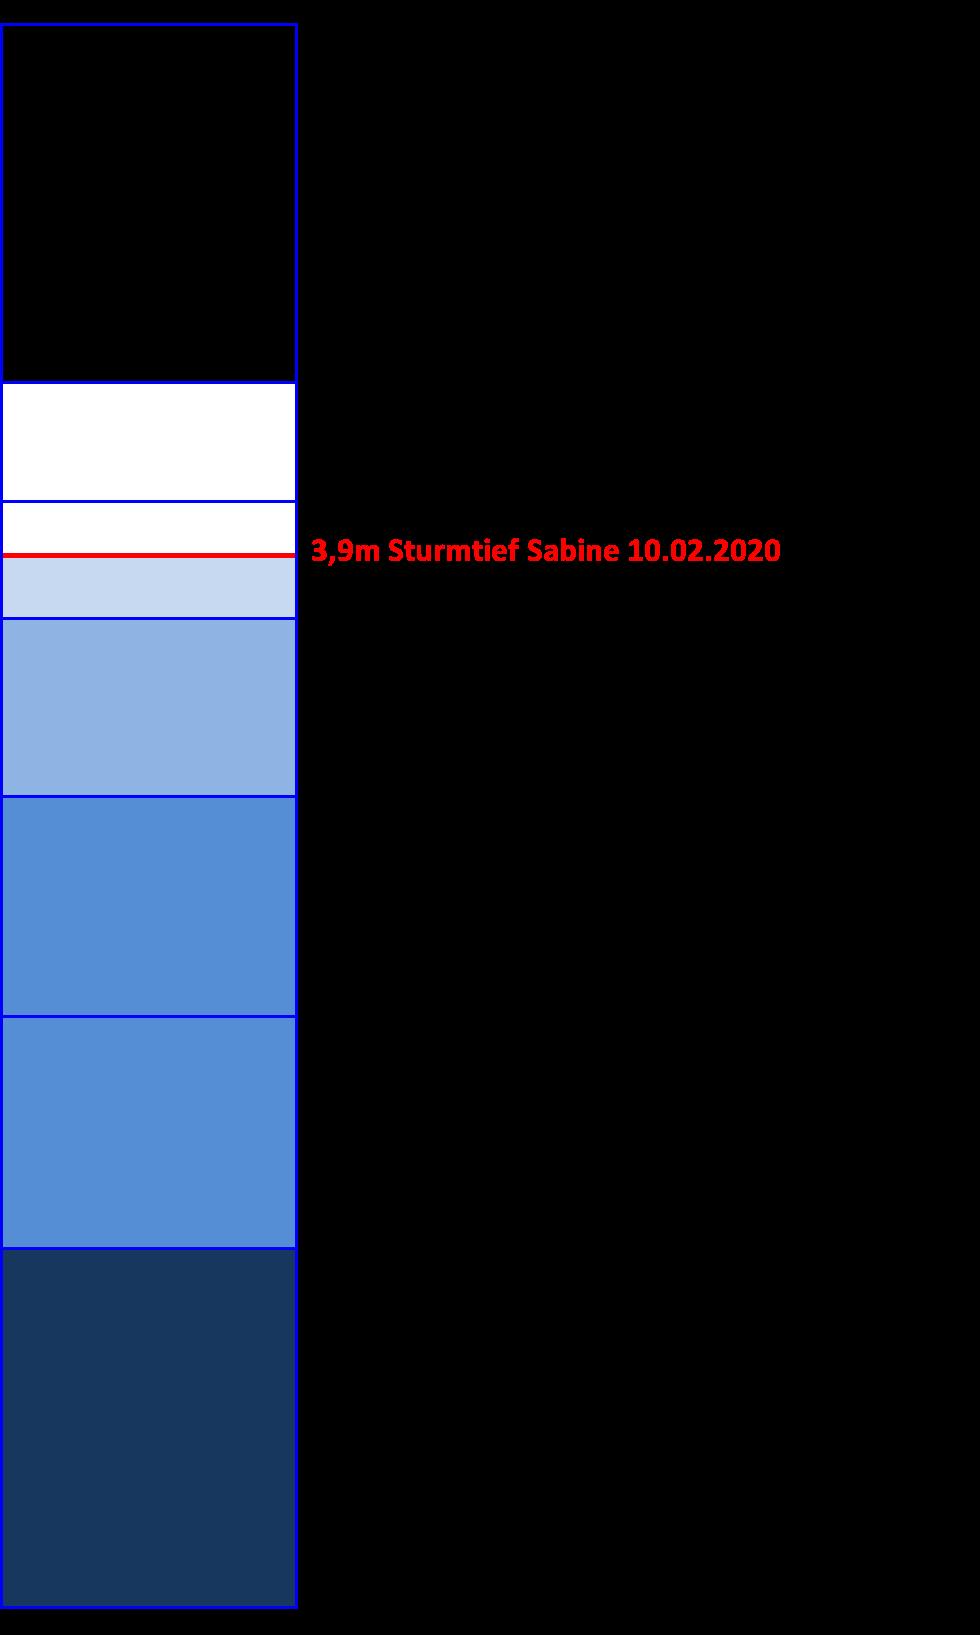 #Pegel Bremerhaven Daten